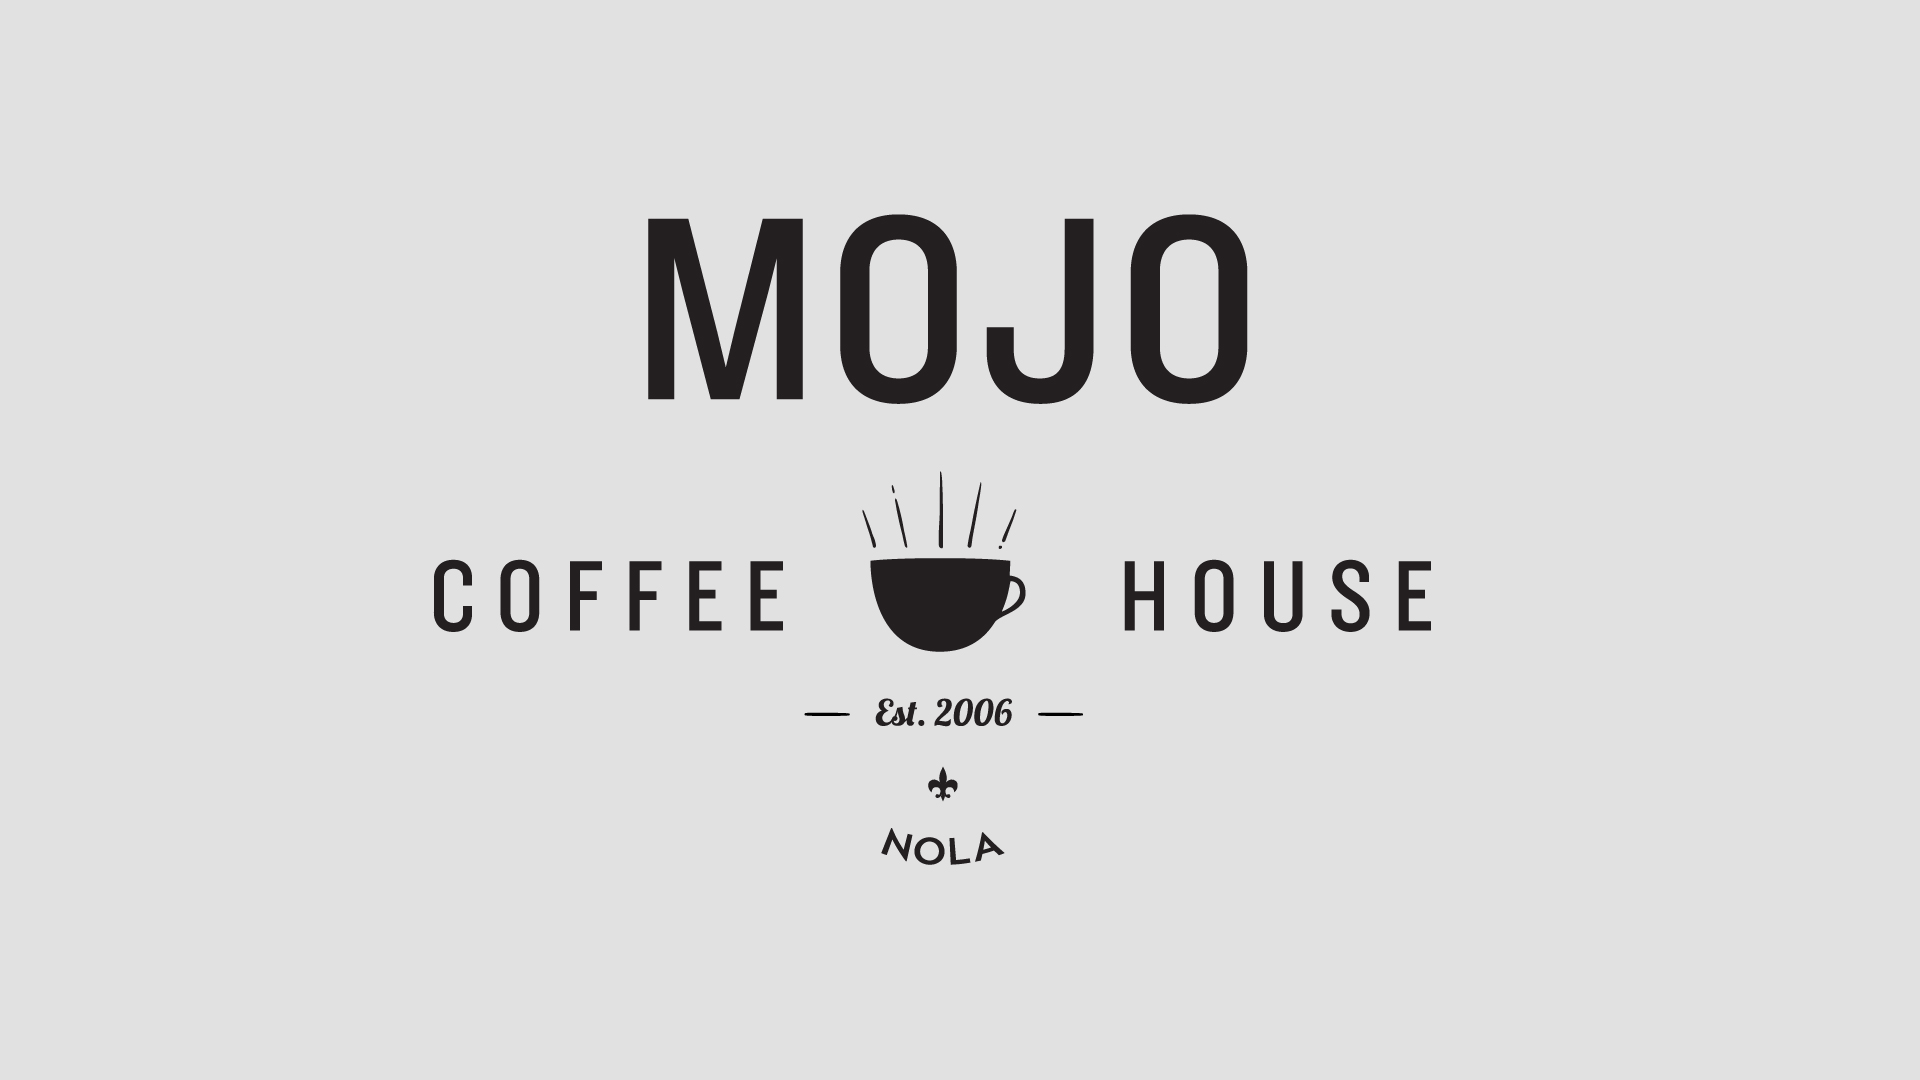 mojo-coffee-house-logo.jpg